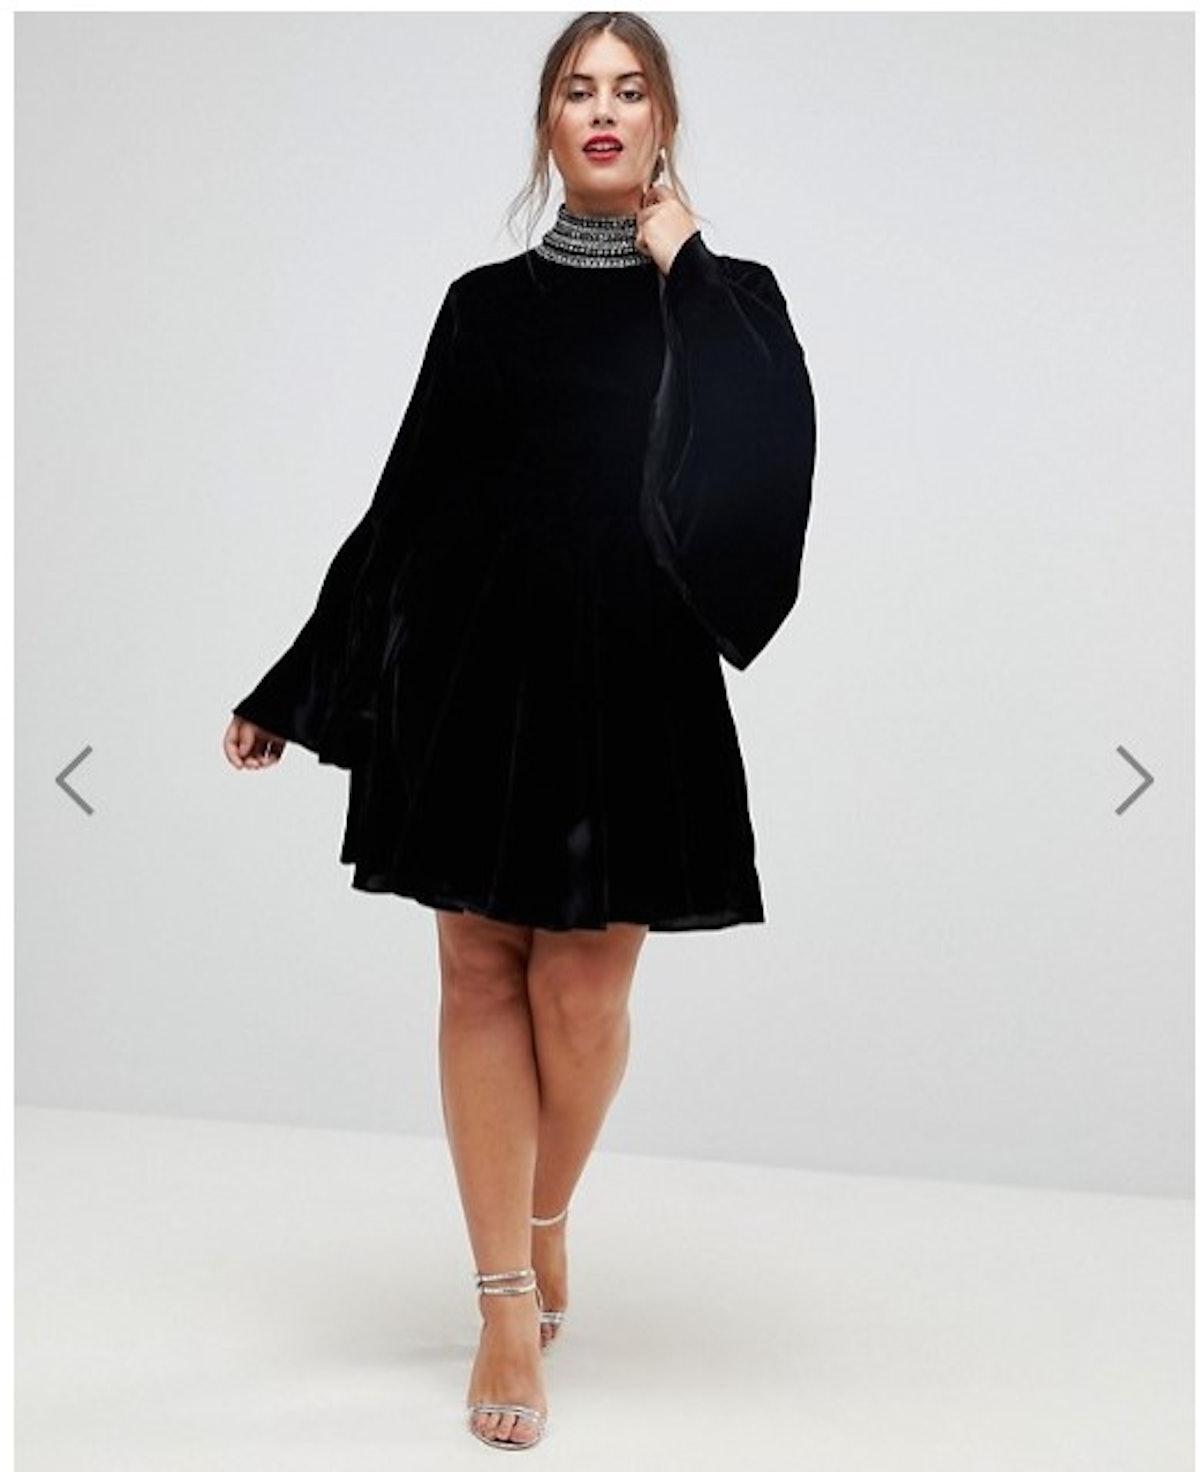 ASOS CURVE Velvet Skater with Embellished High Neck Mini Dress